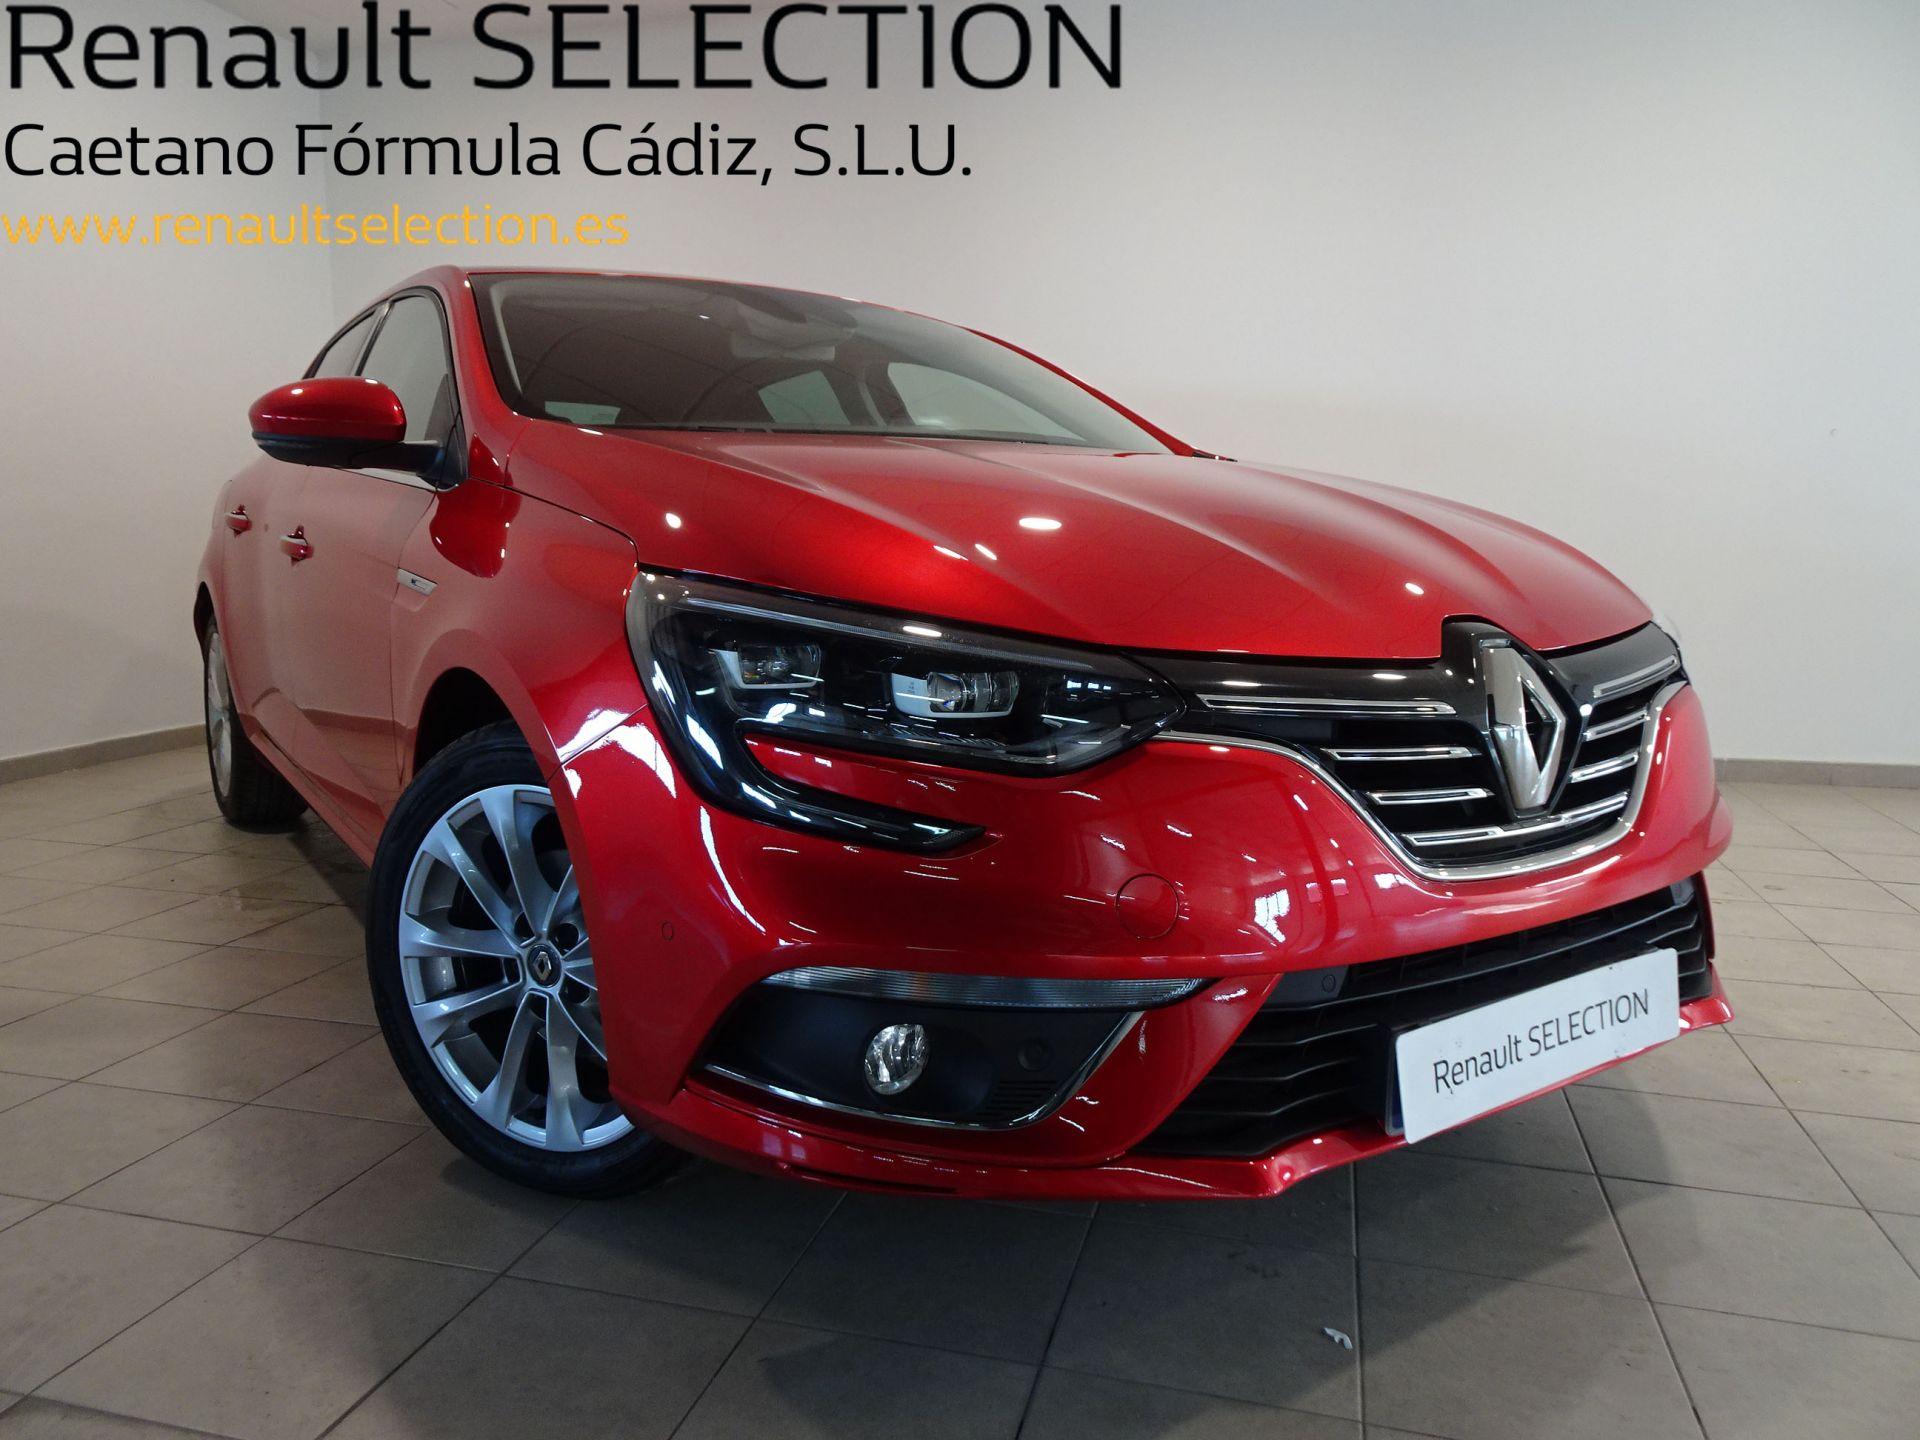 Renault Megane Zen Tce GPF 103 kW (140CV) segunda mano Cádiz